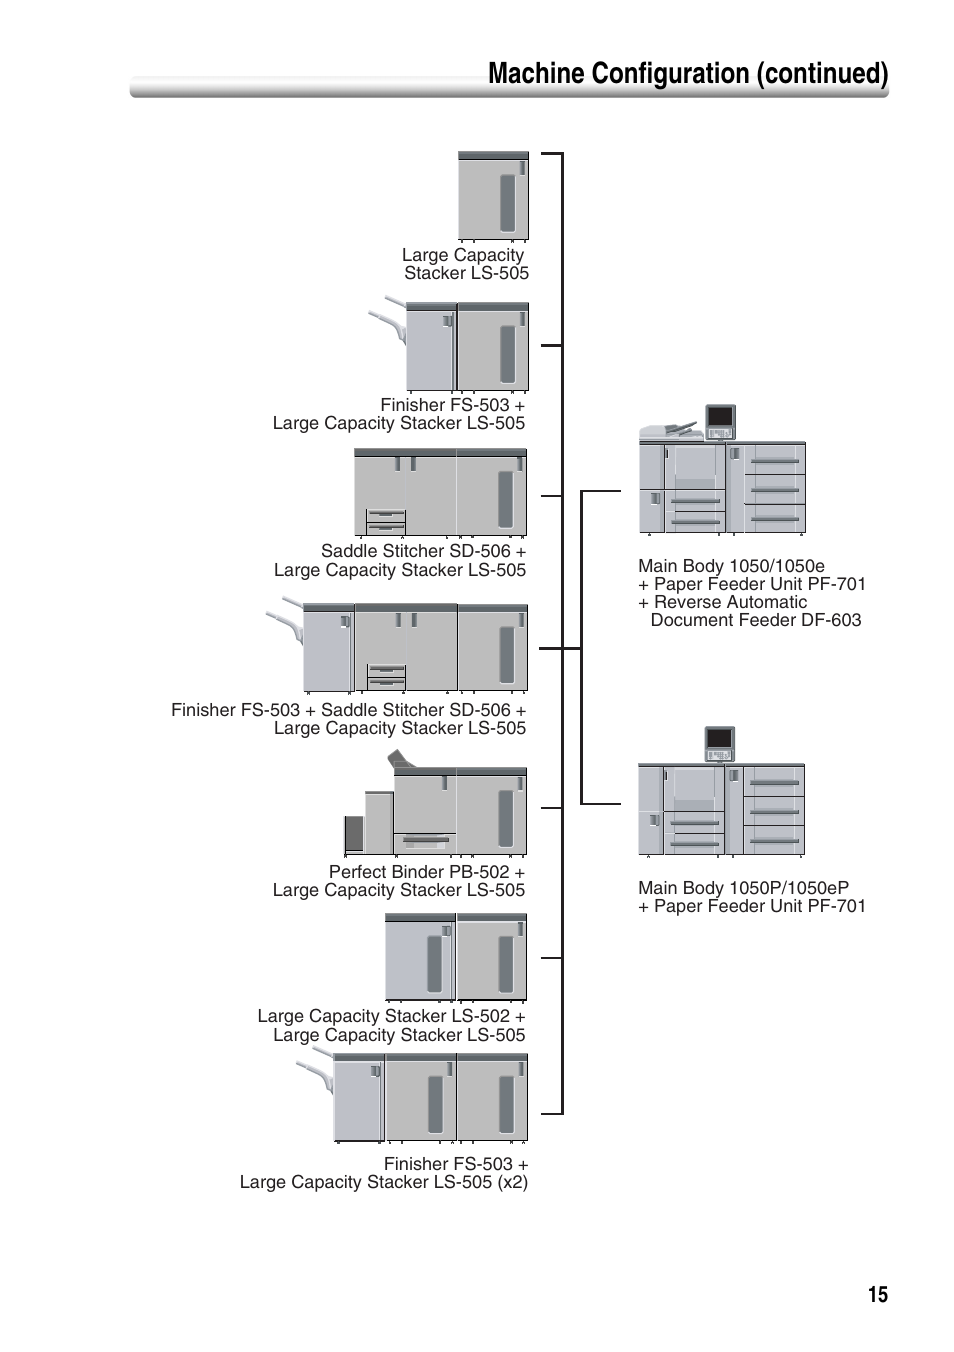 Machine configuration (continued) | Konica Minolta bizhub PRO 1050P User  Manual | Page 19 / 88